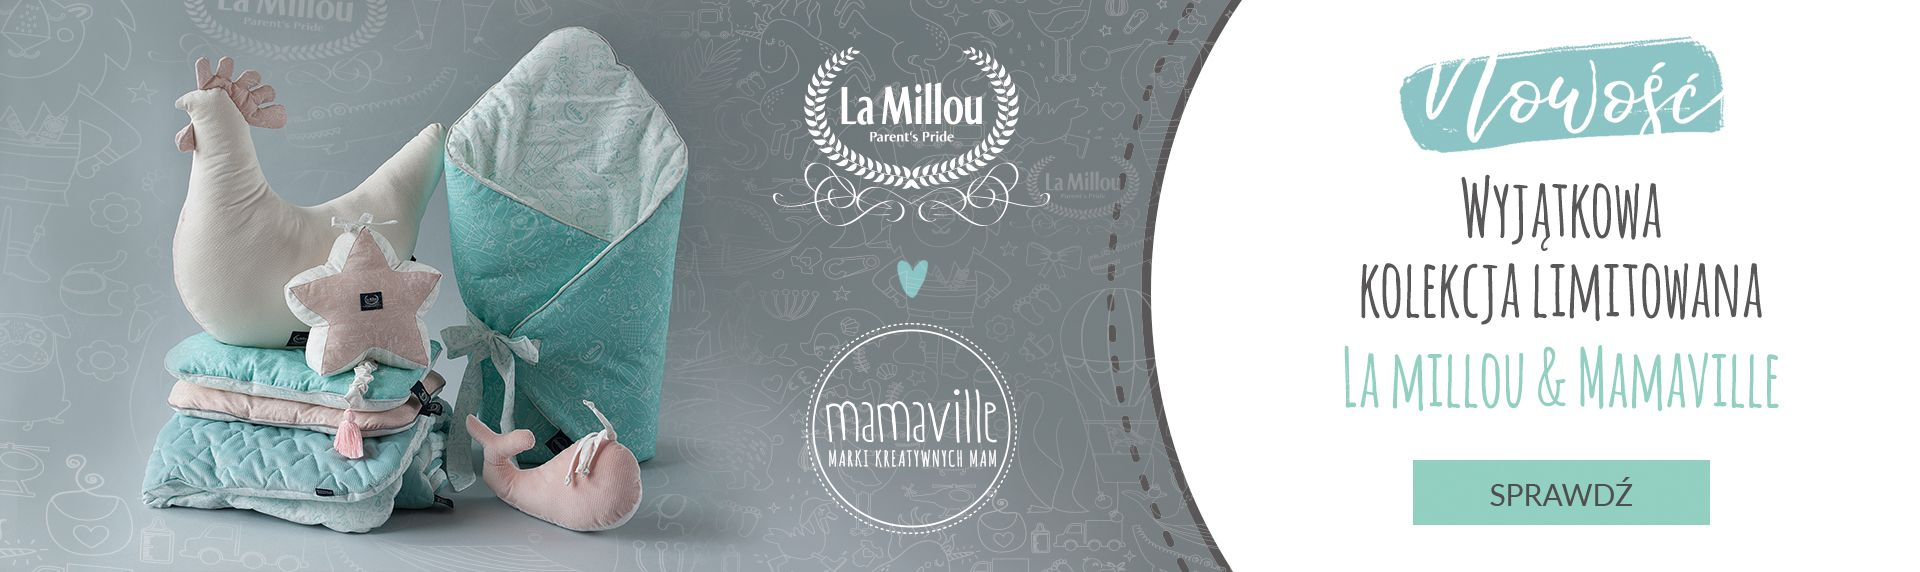 La millou & Mamaville